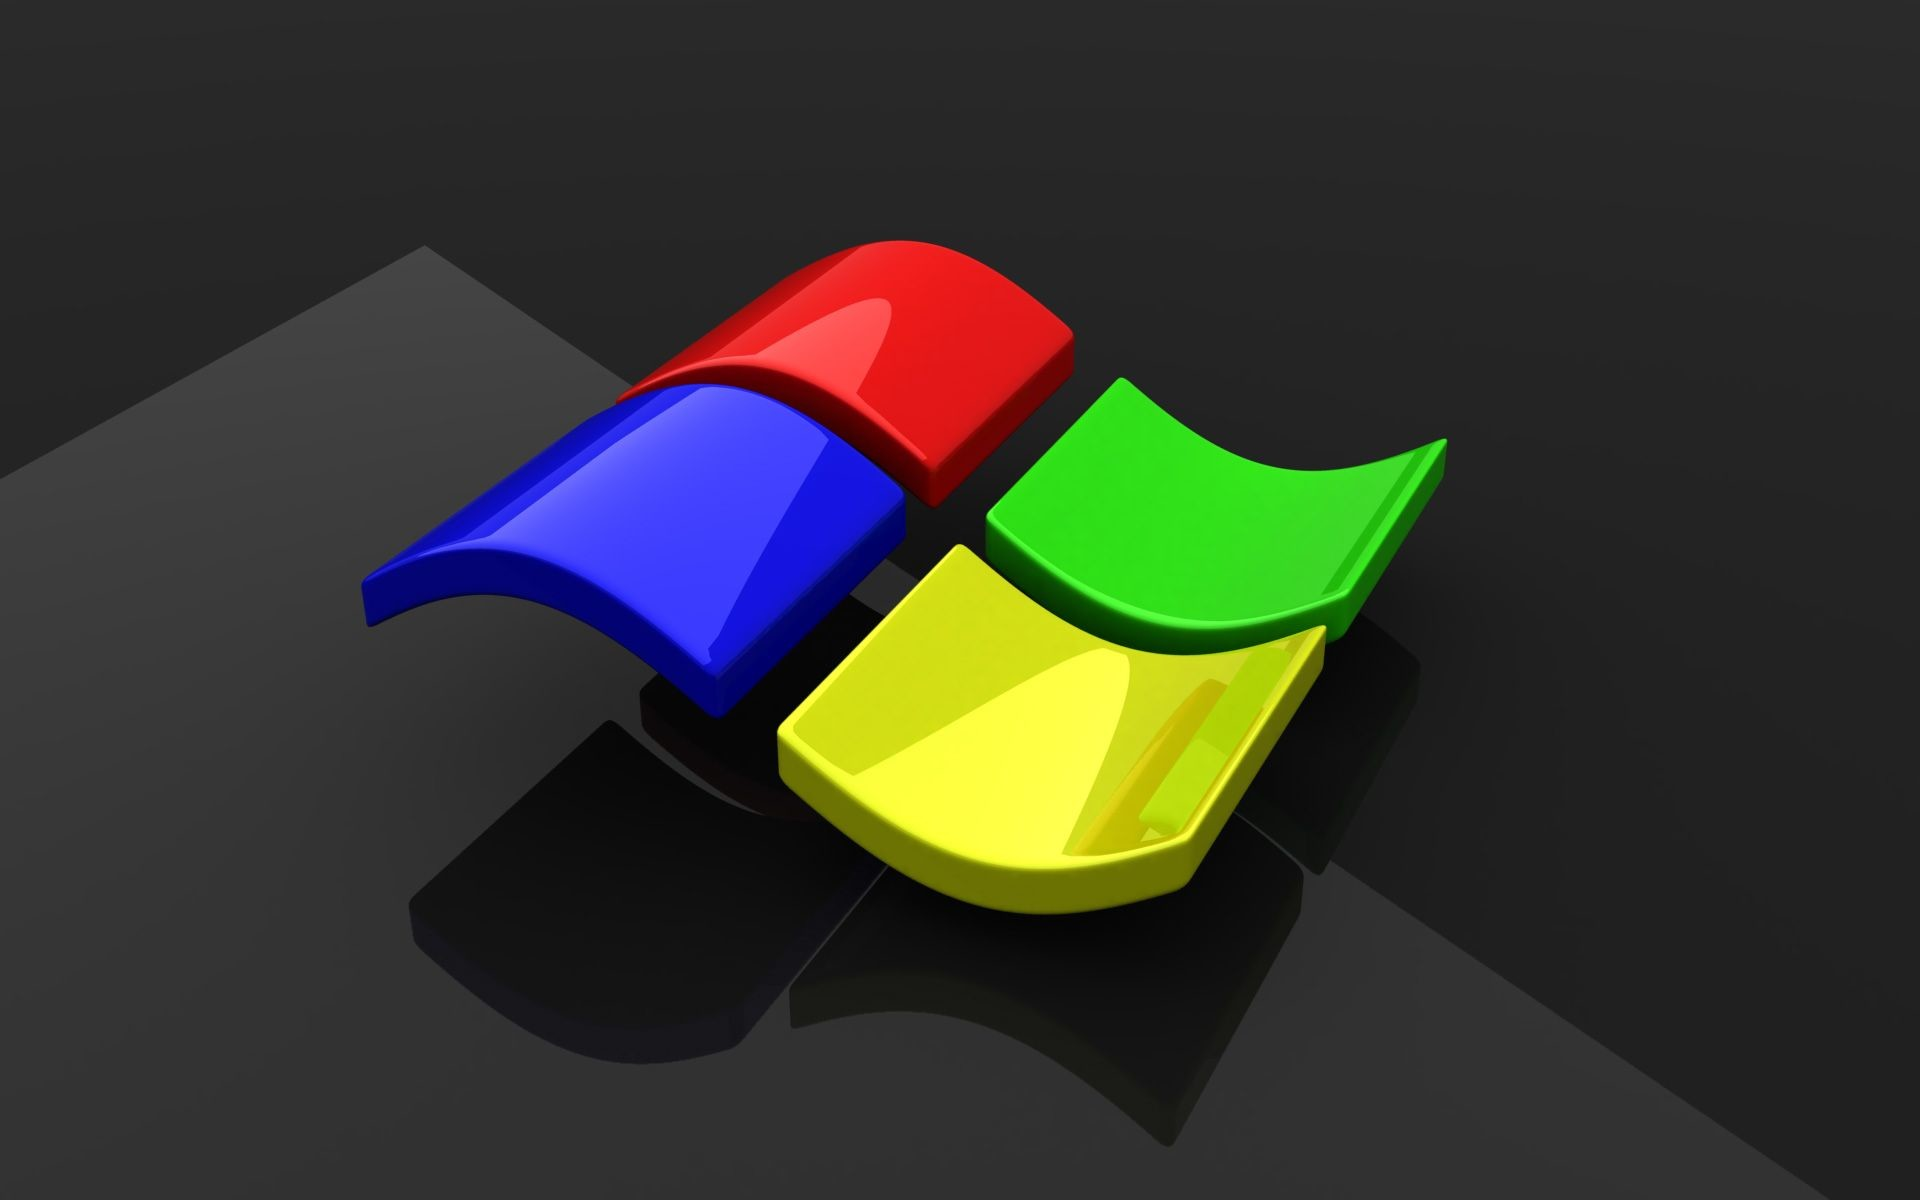 Windows xp wallpaper hd wallpapertag - Hd wallpapers for pc windows ...